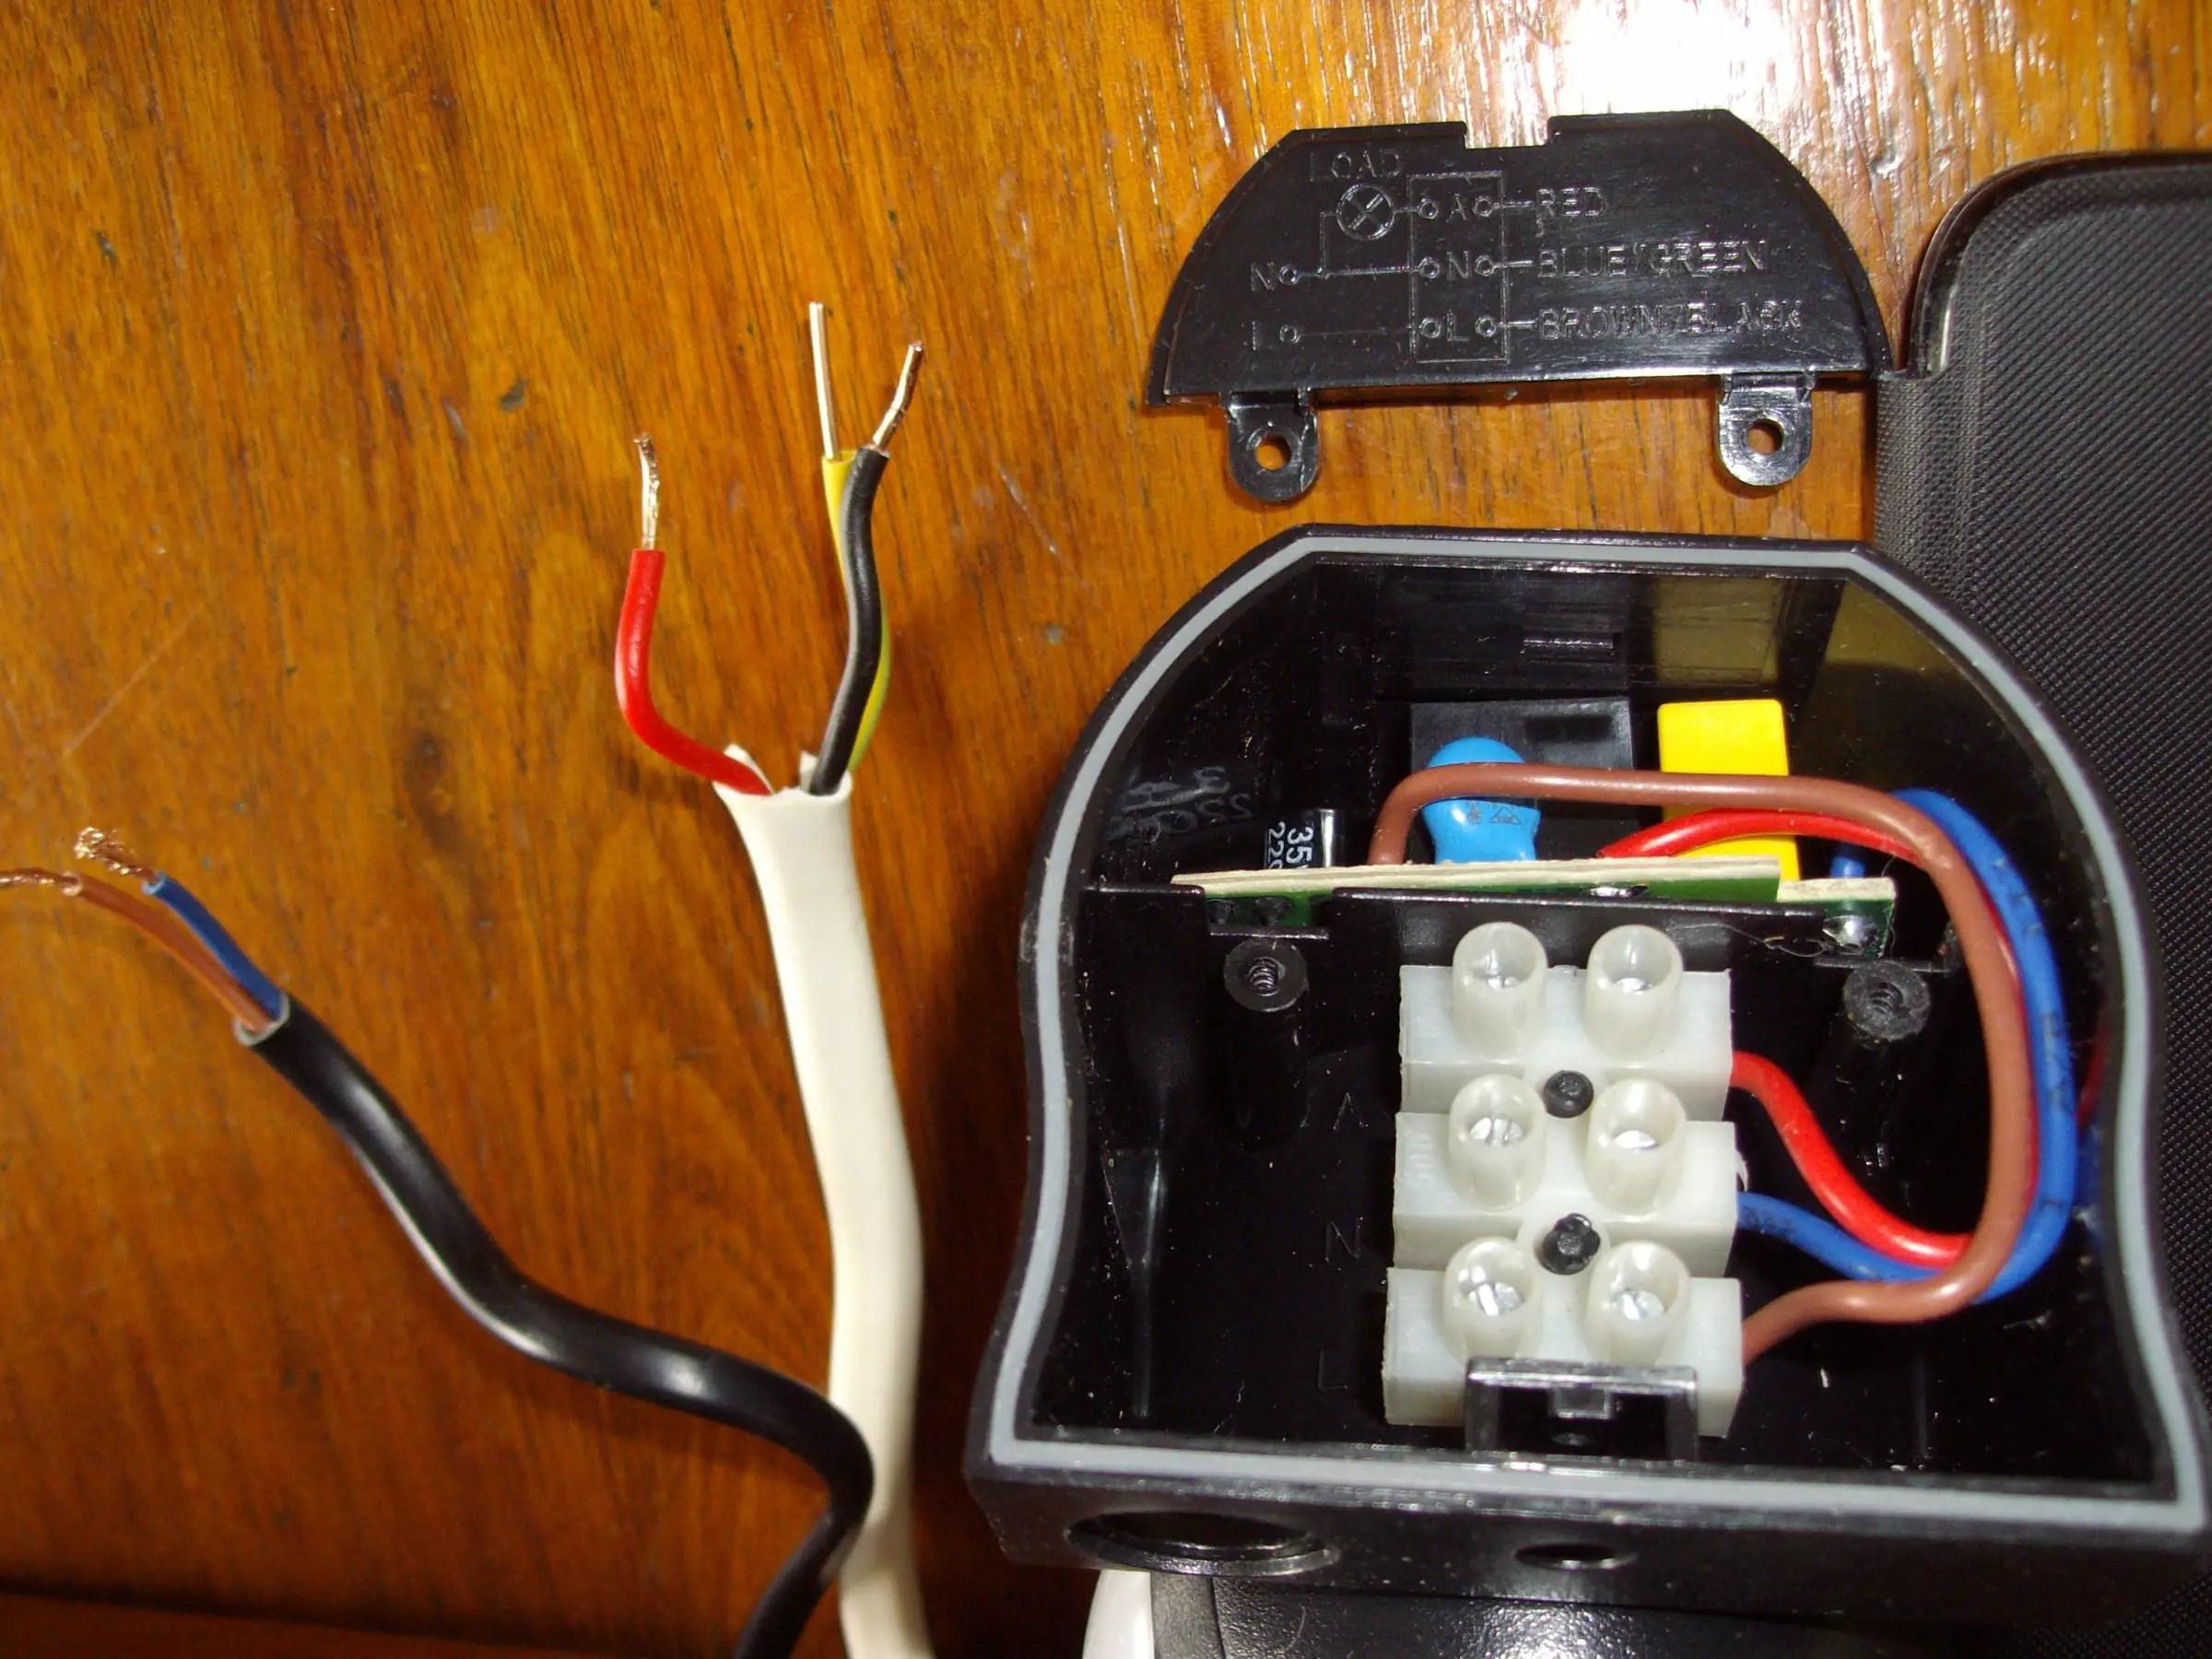 pir switch wiring diagram 2001 dodge ram trailer plug 3 terminal sensor to strobe light and